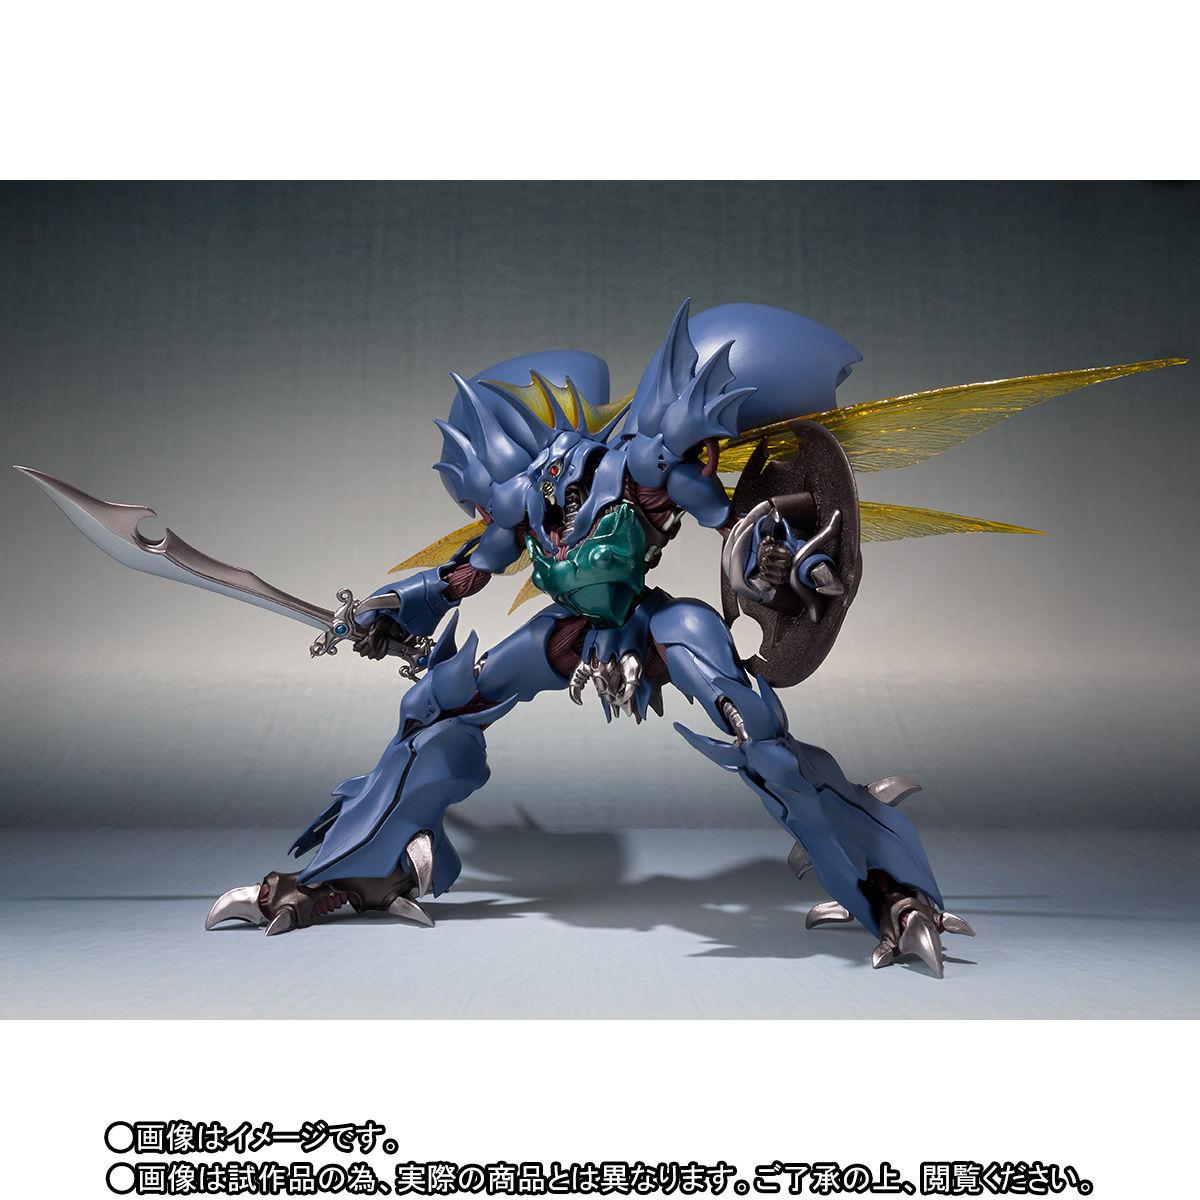 ROBOT魂〈SIDE AB〉『ギトール』聖戦士ダンバイン 可動フィギュア 可動フィギュア-005